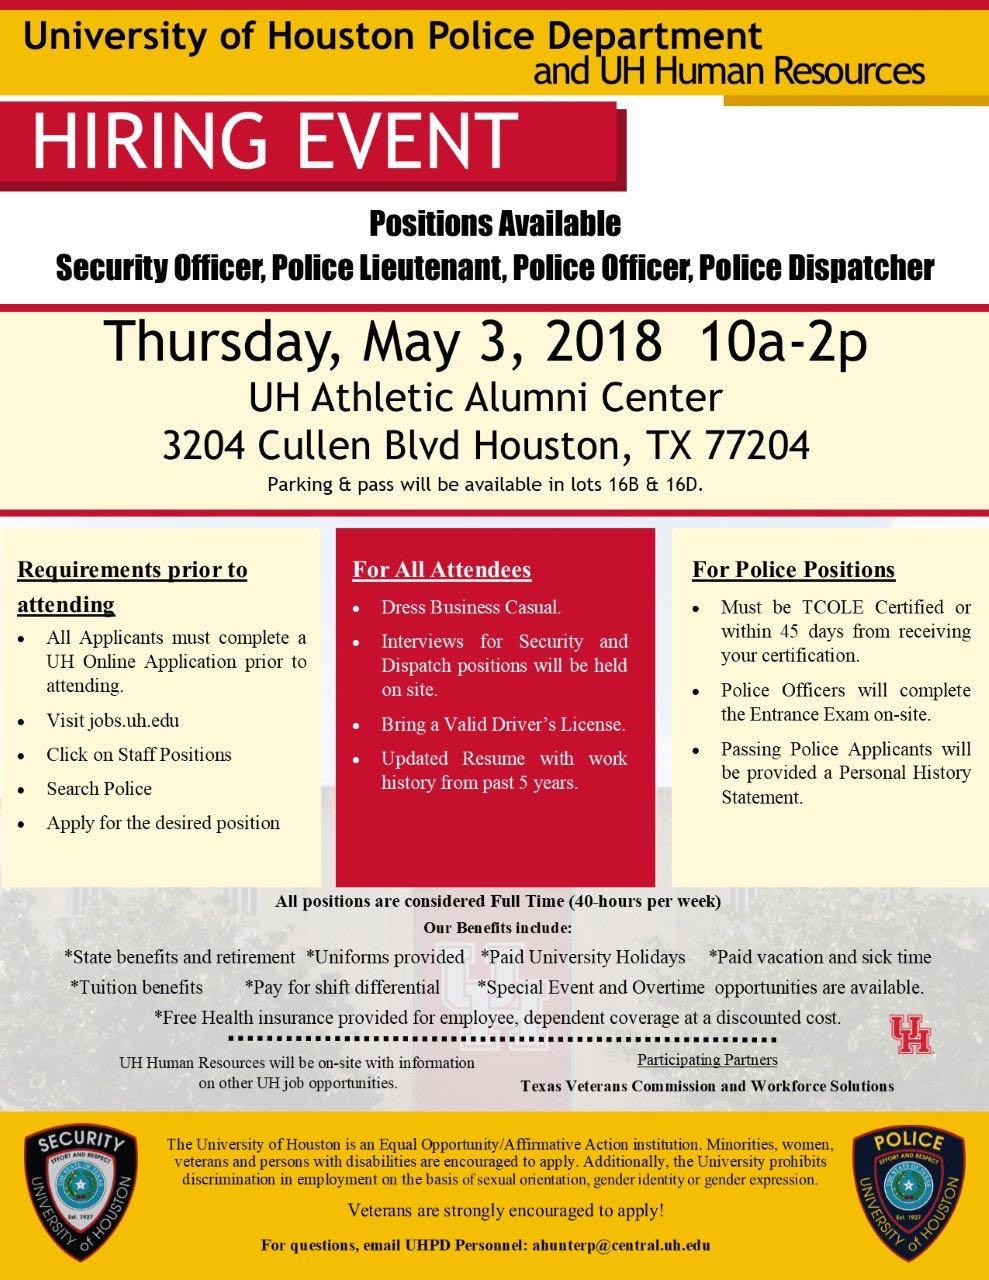 University of Houston Hiring Event